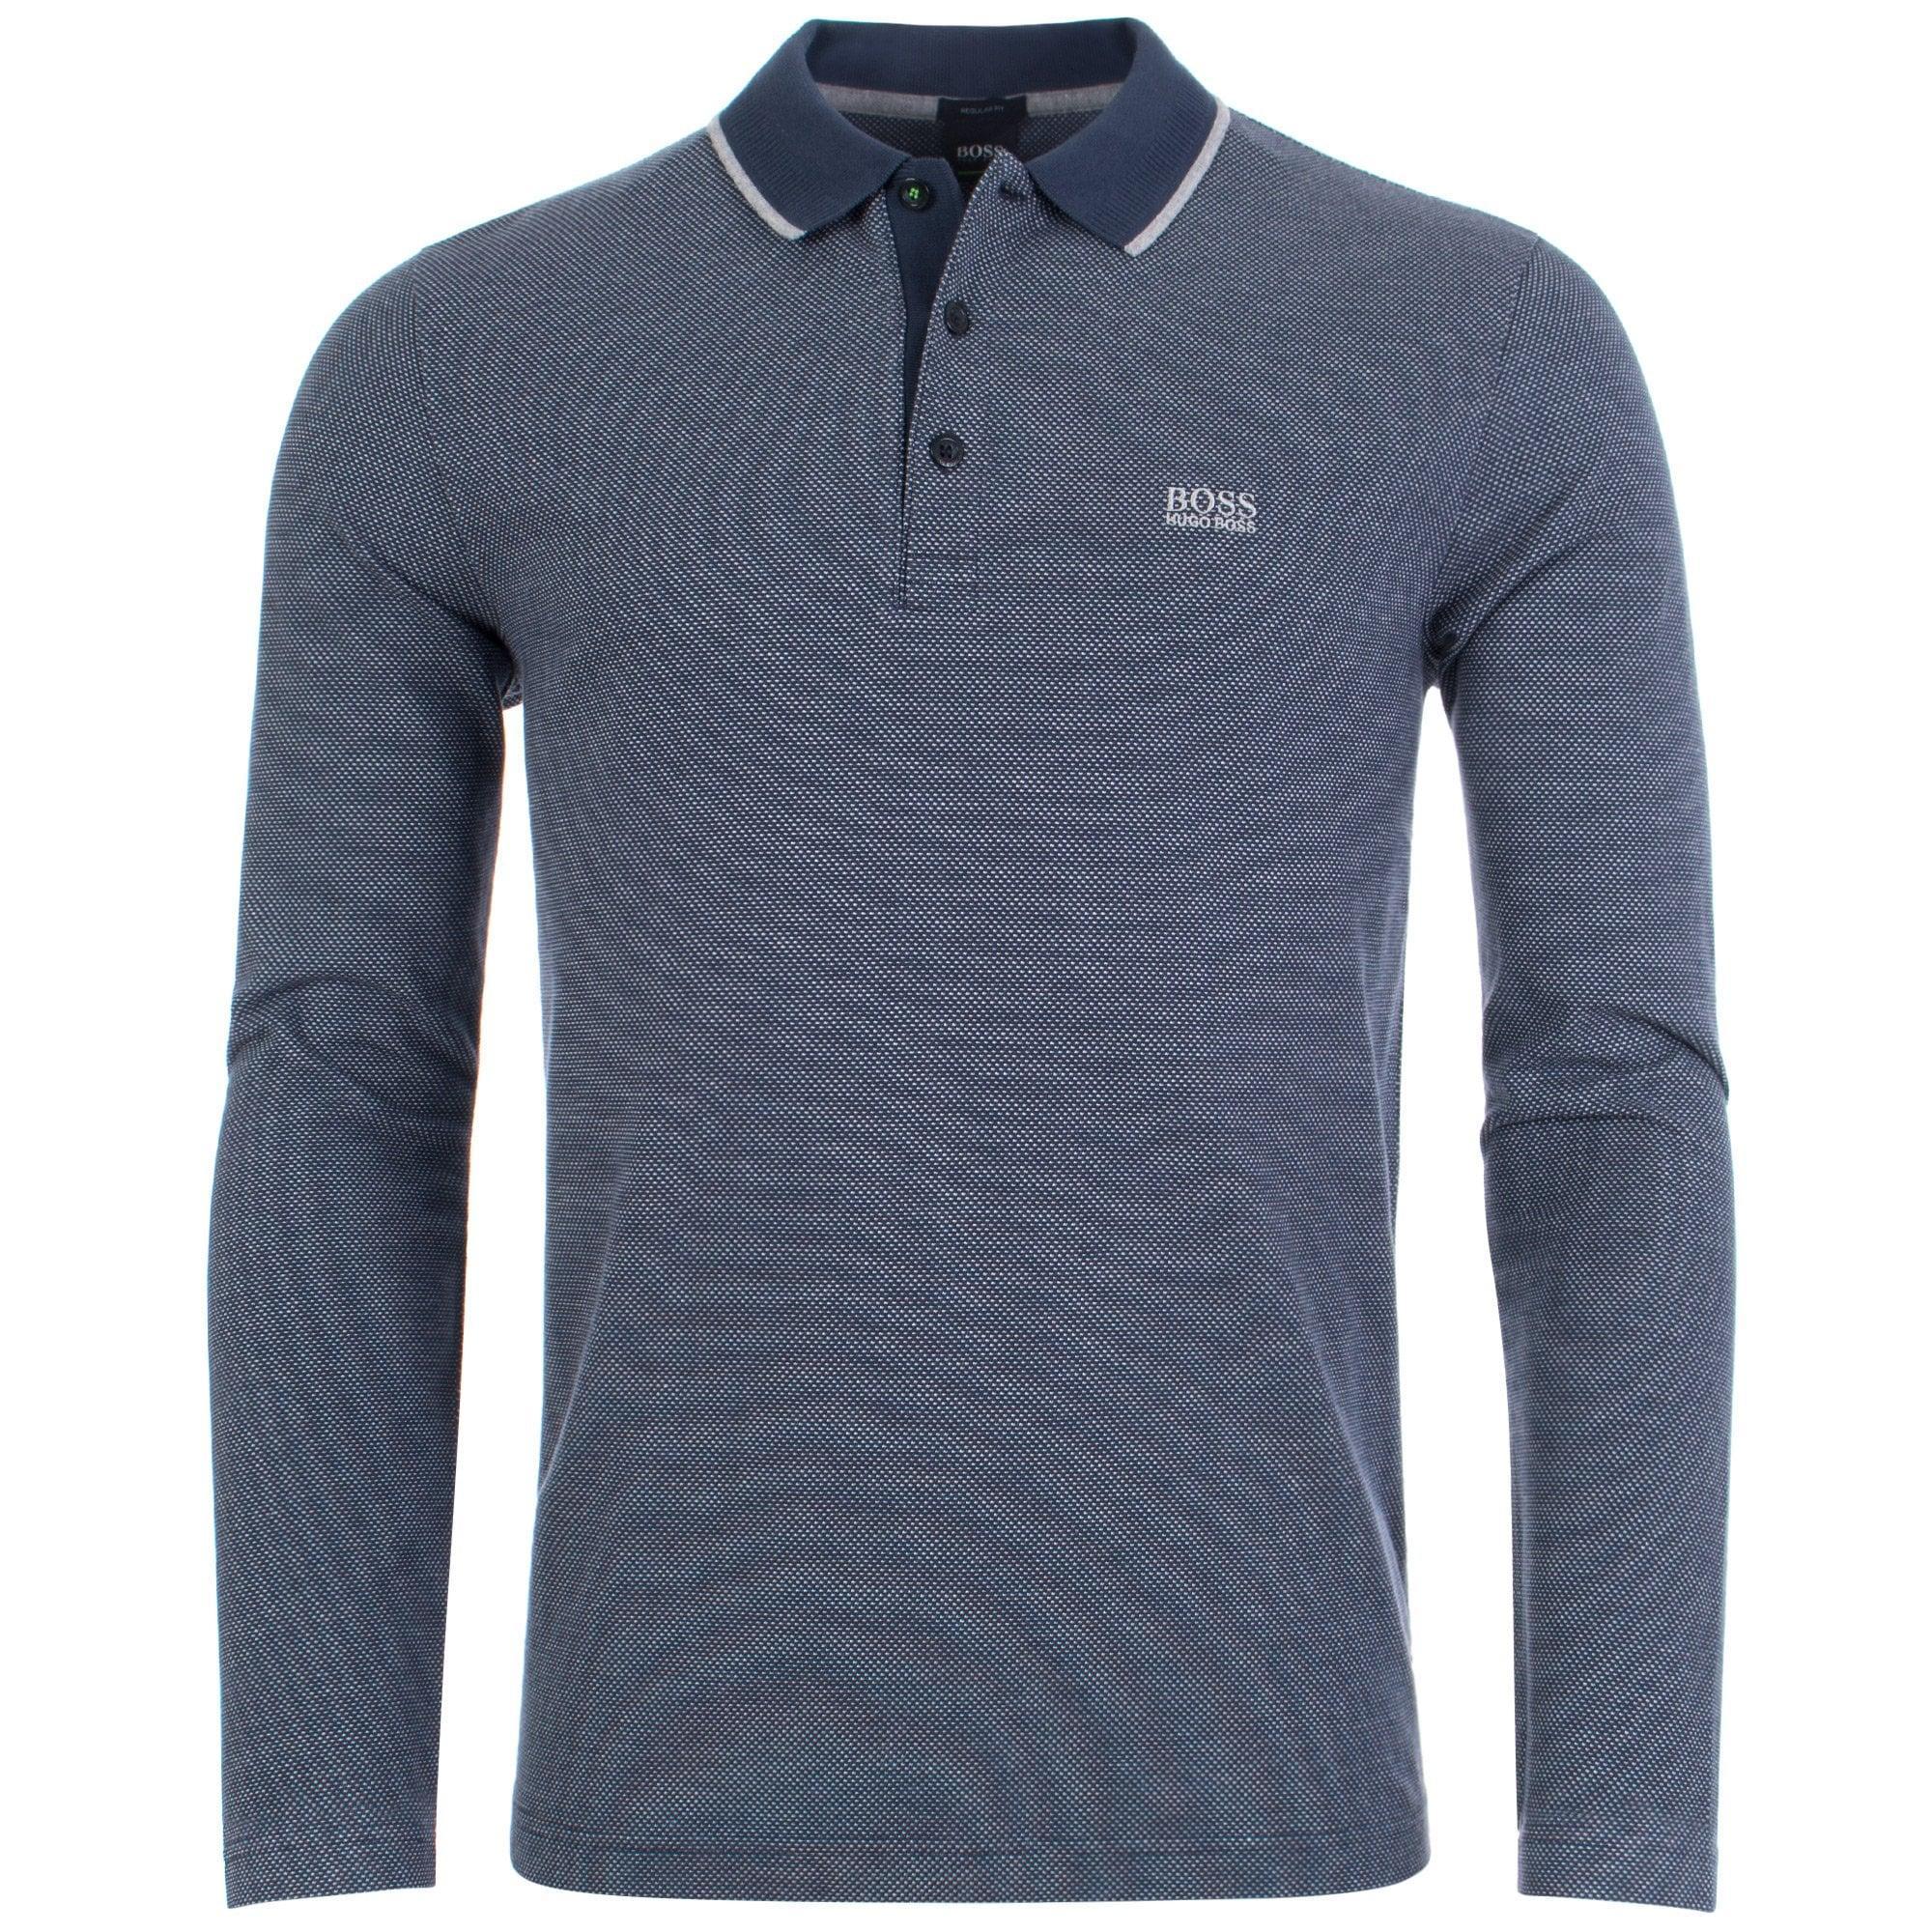 5d3fc3ea1 BOSS Athleisure Plisy 1 Long Sleeve Polo in Blue for Men - Lyst